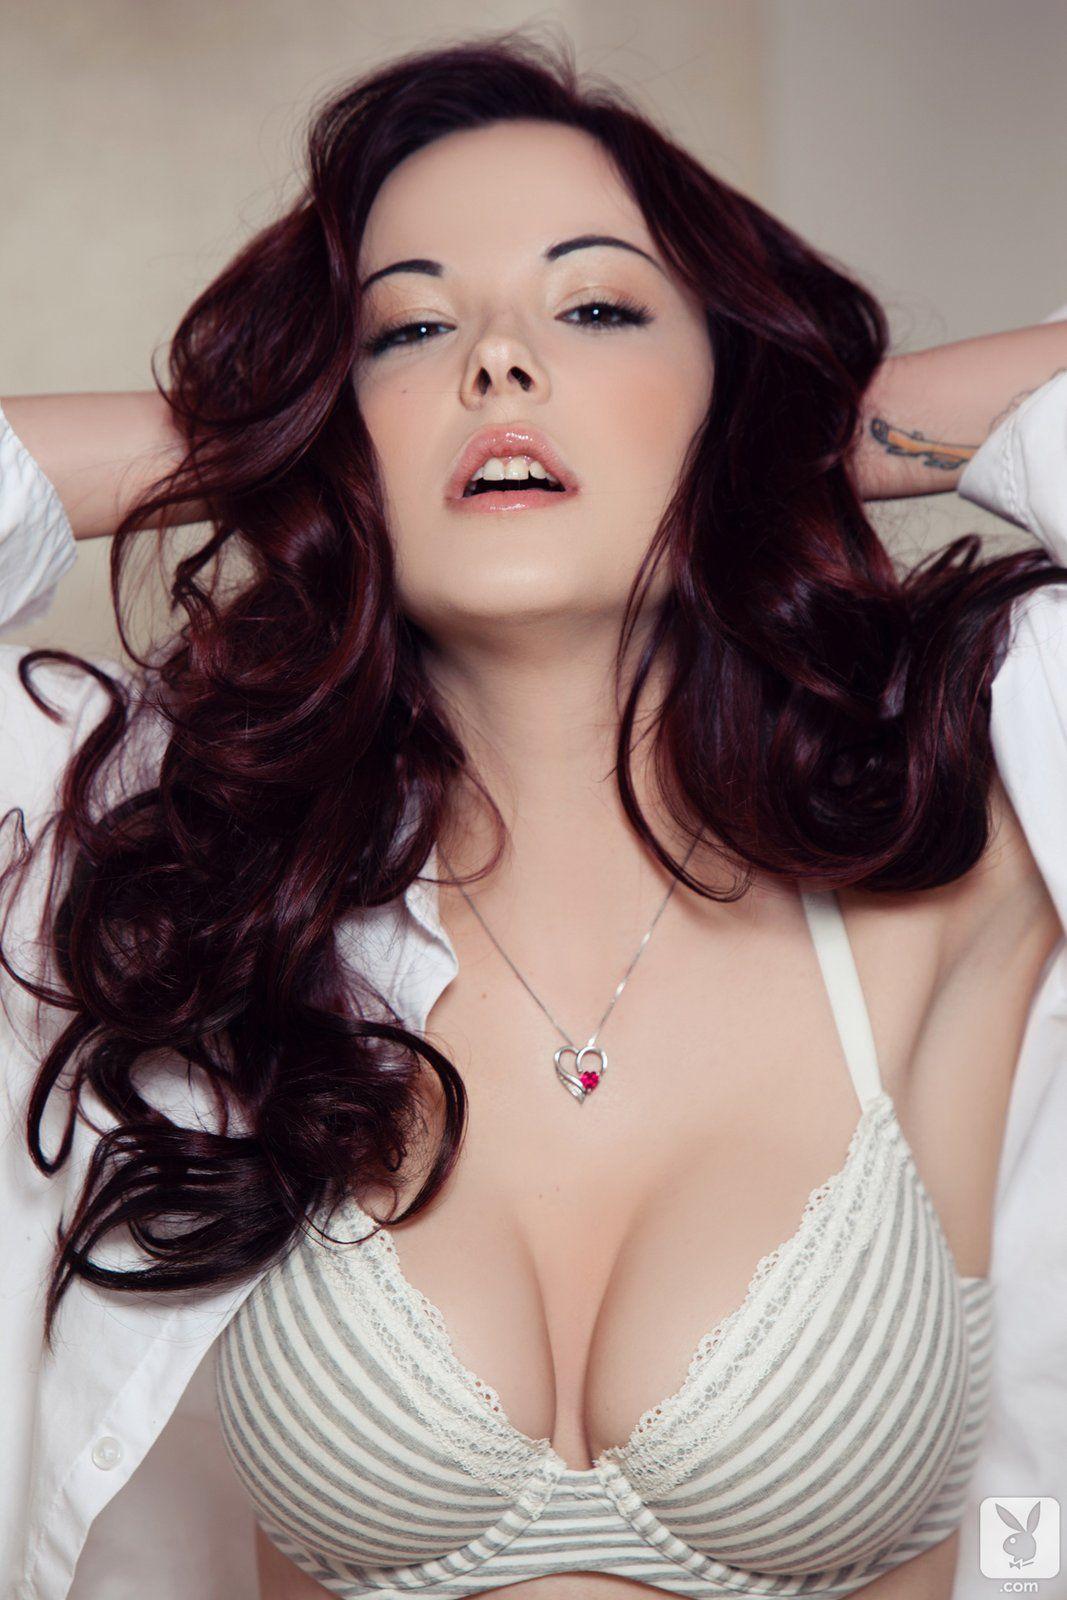 Snapchat Elizabeth Marxs nudes (14 photo), Tits, Bikini, Twitter, braless 2018